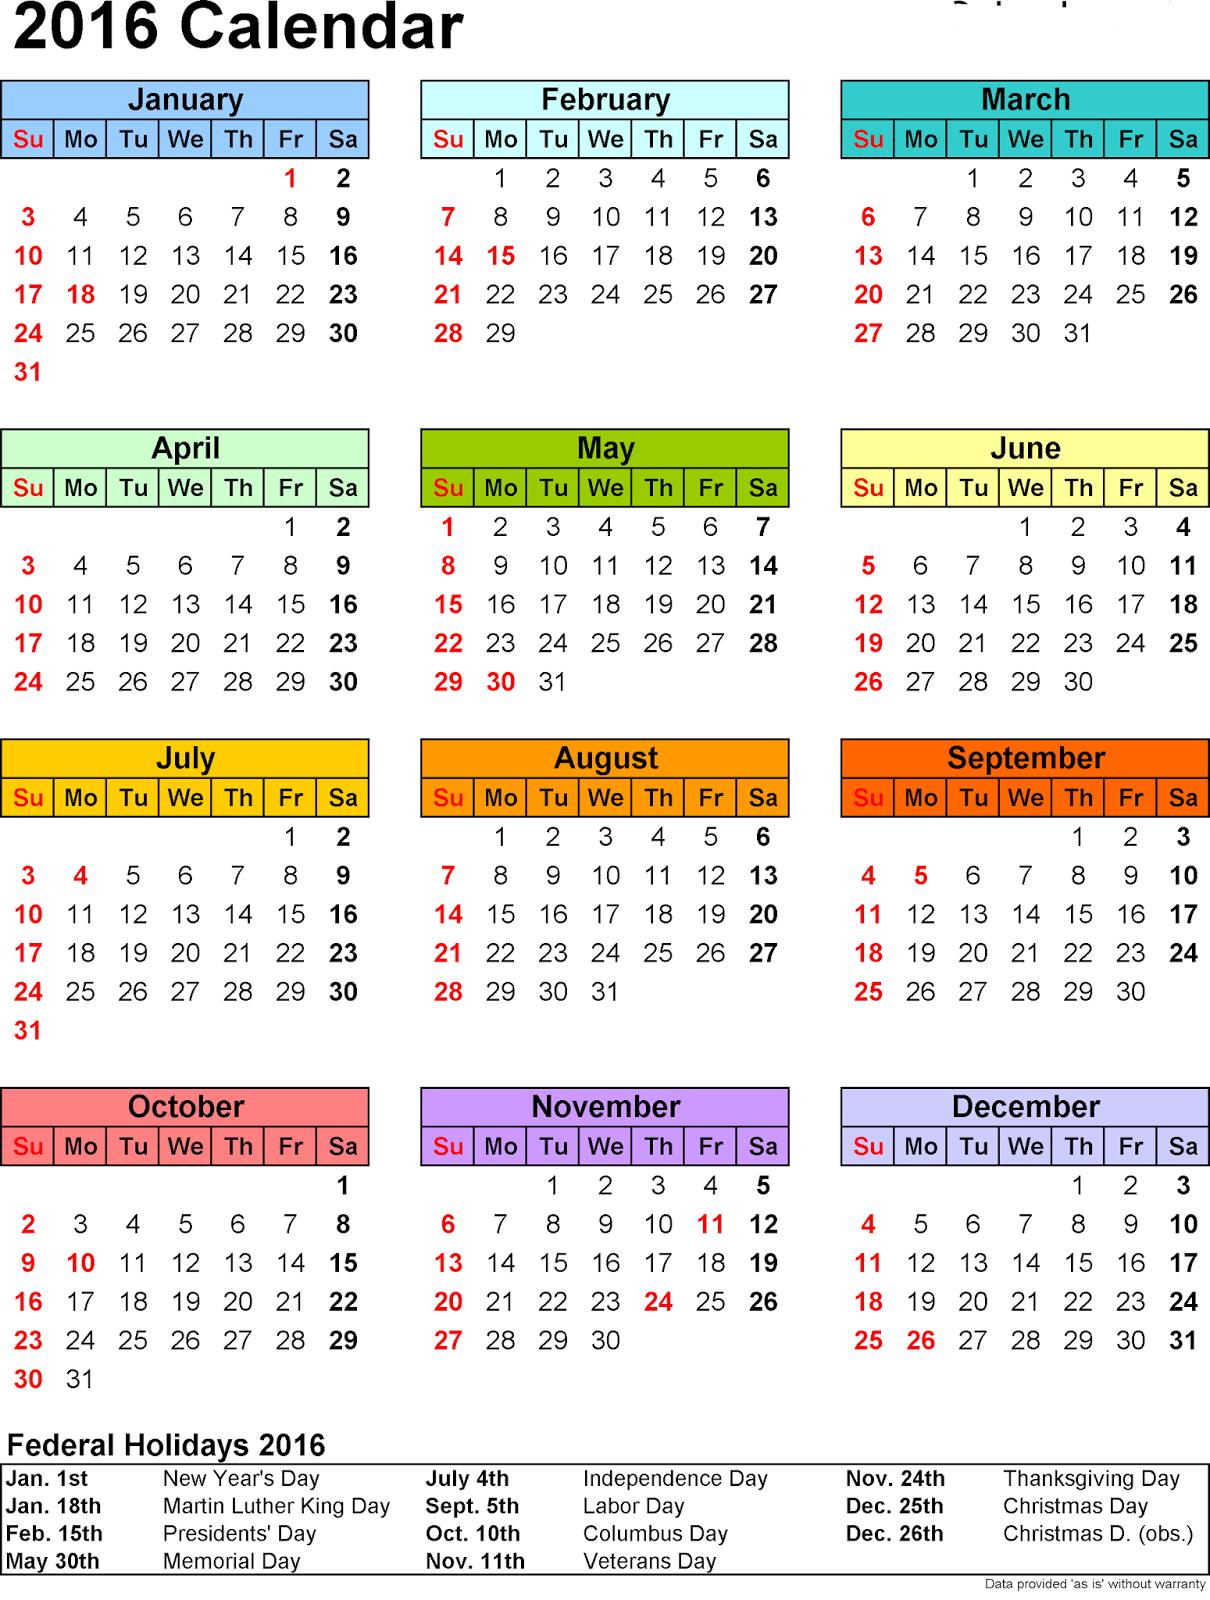 Free]^ Printable Calendar 2016: 2016 Calendar with Holidays Images